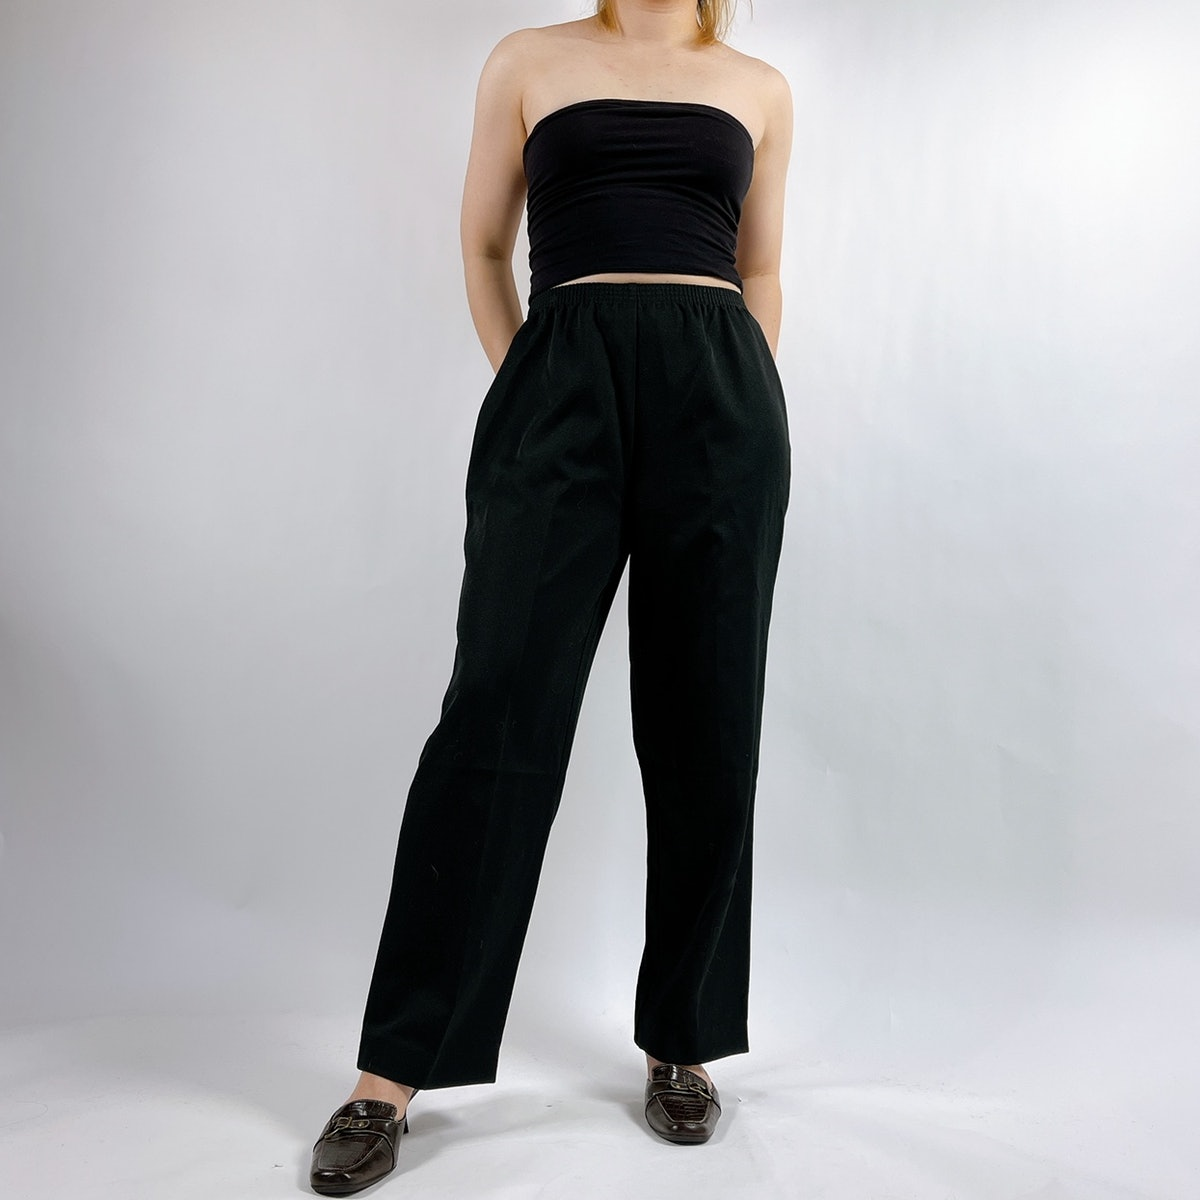 Madeinsaigon Vintage Koret Black Casual Pants